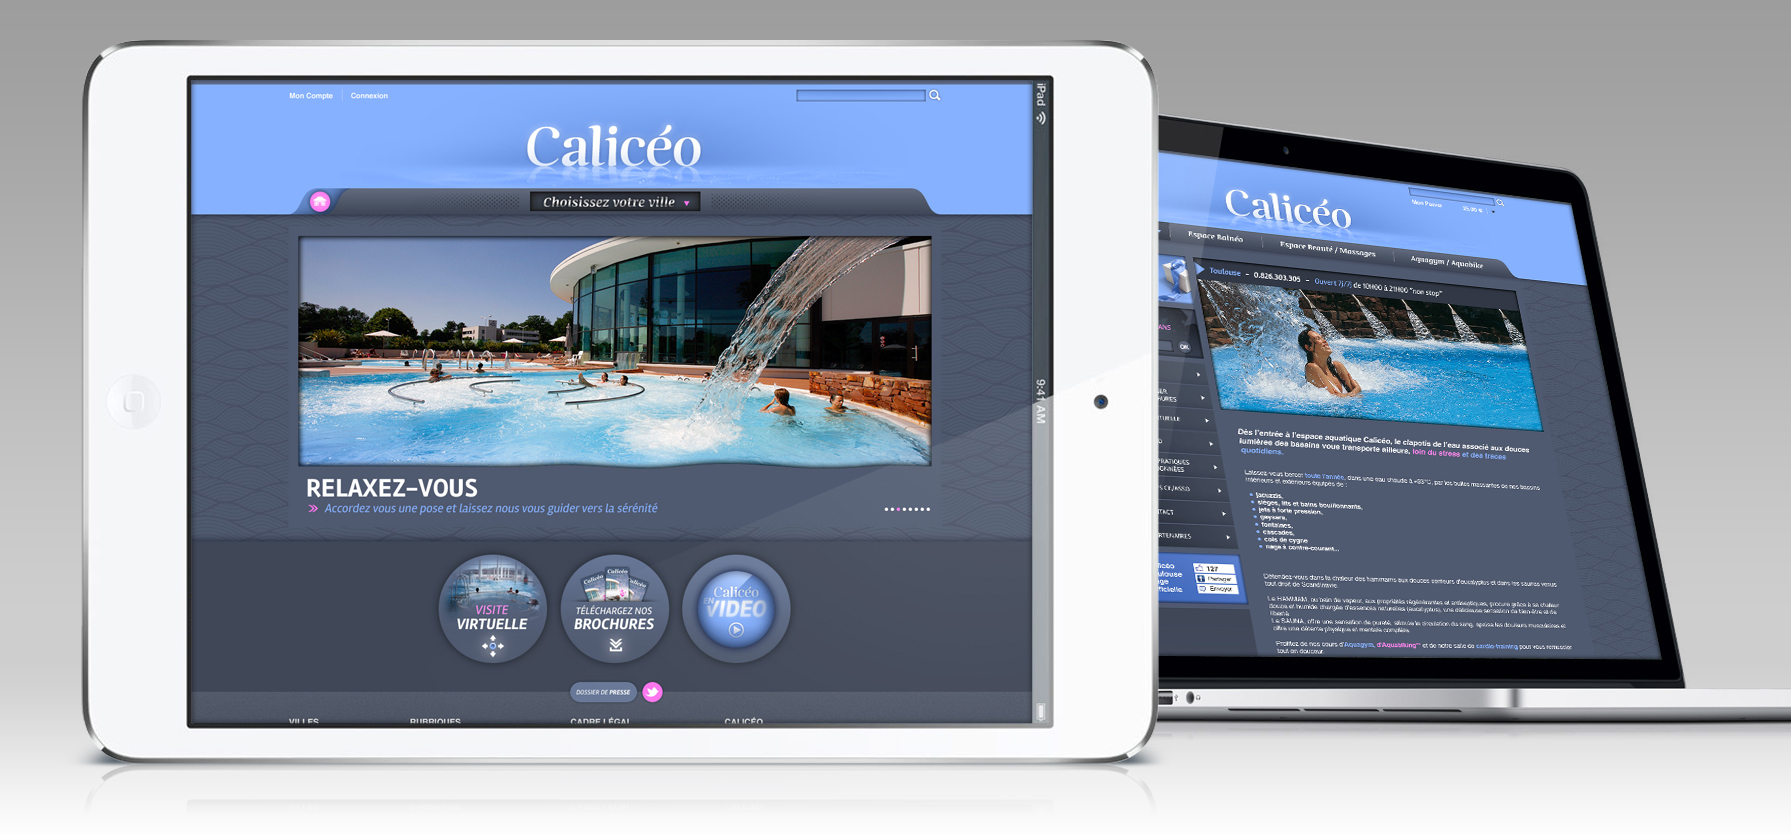 caliceo_web_2